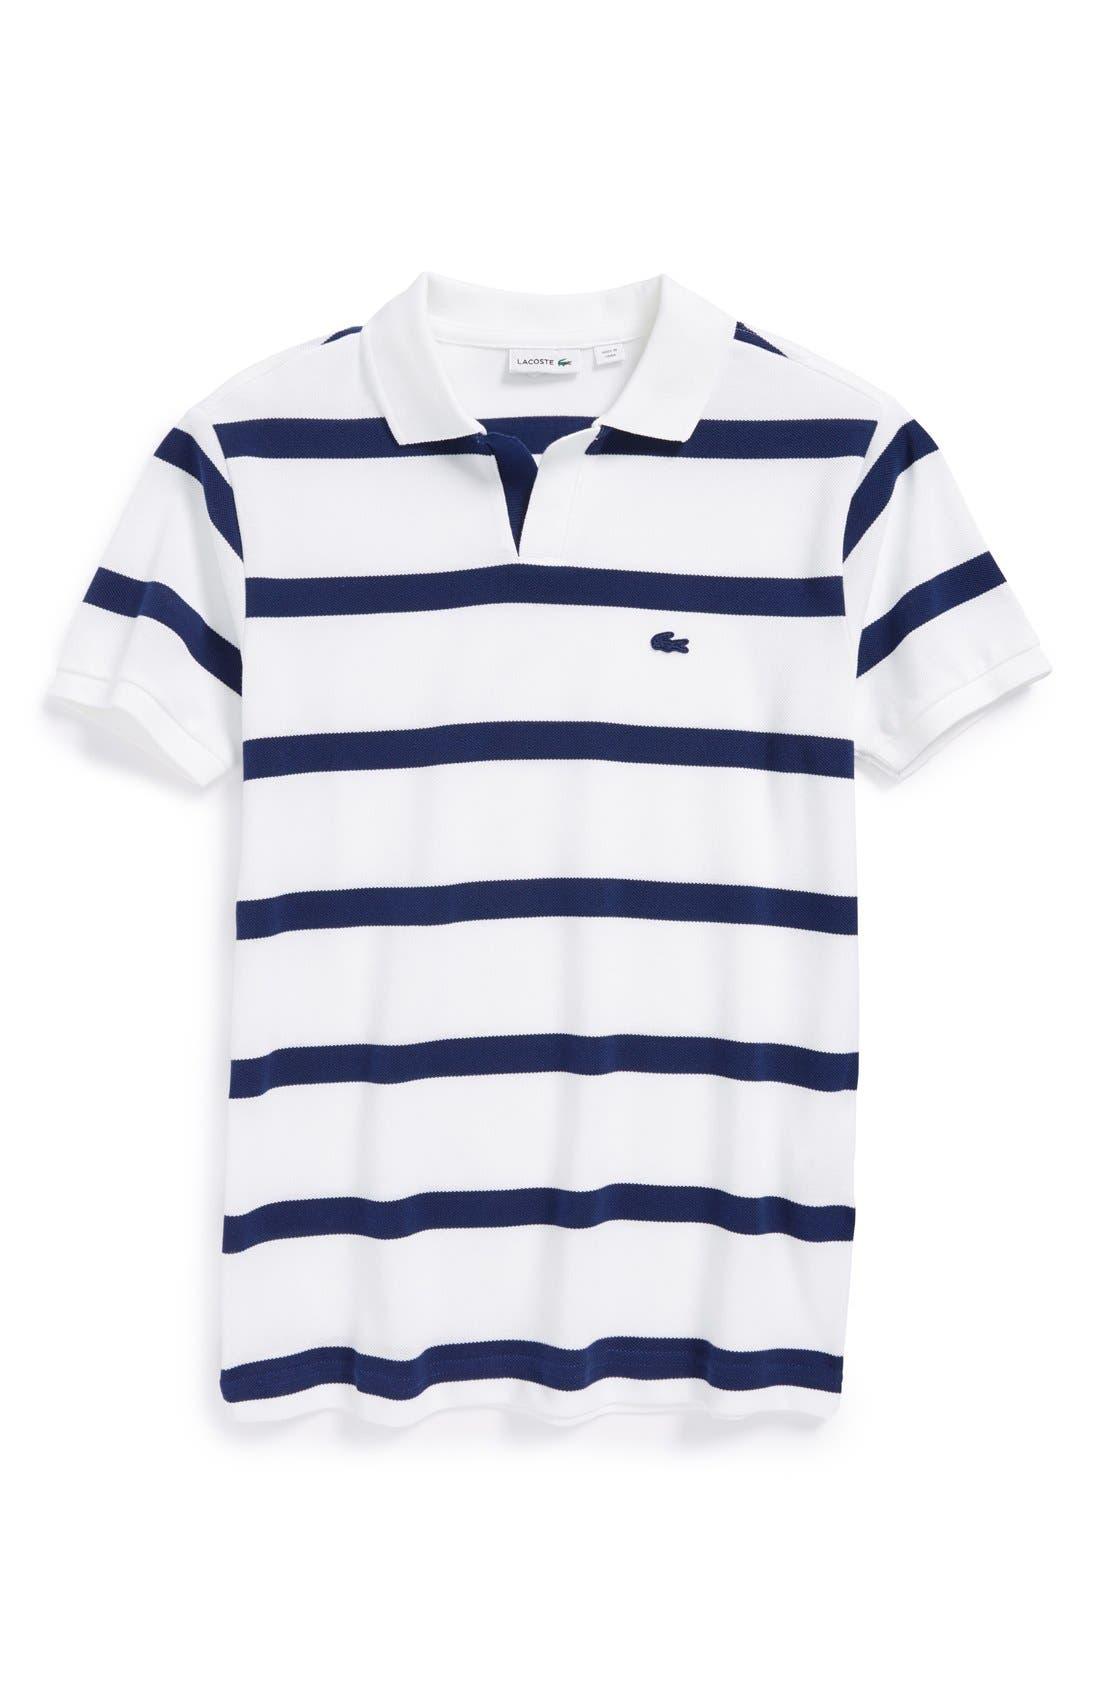 Main Image - Lacoste Stripe Cotton Piqué Polo (Little Boys & Big Boys)